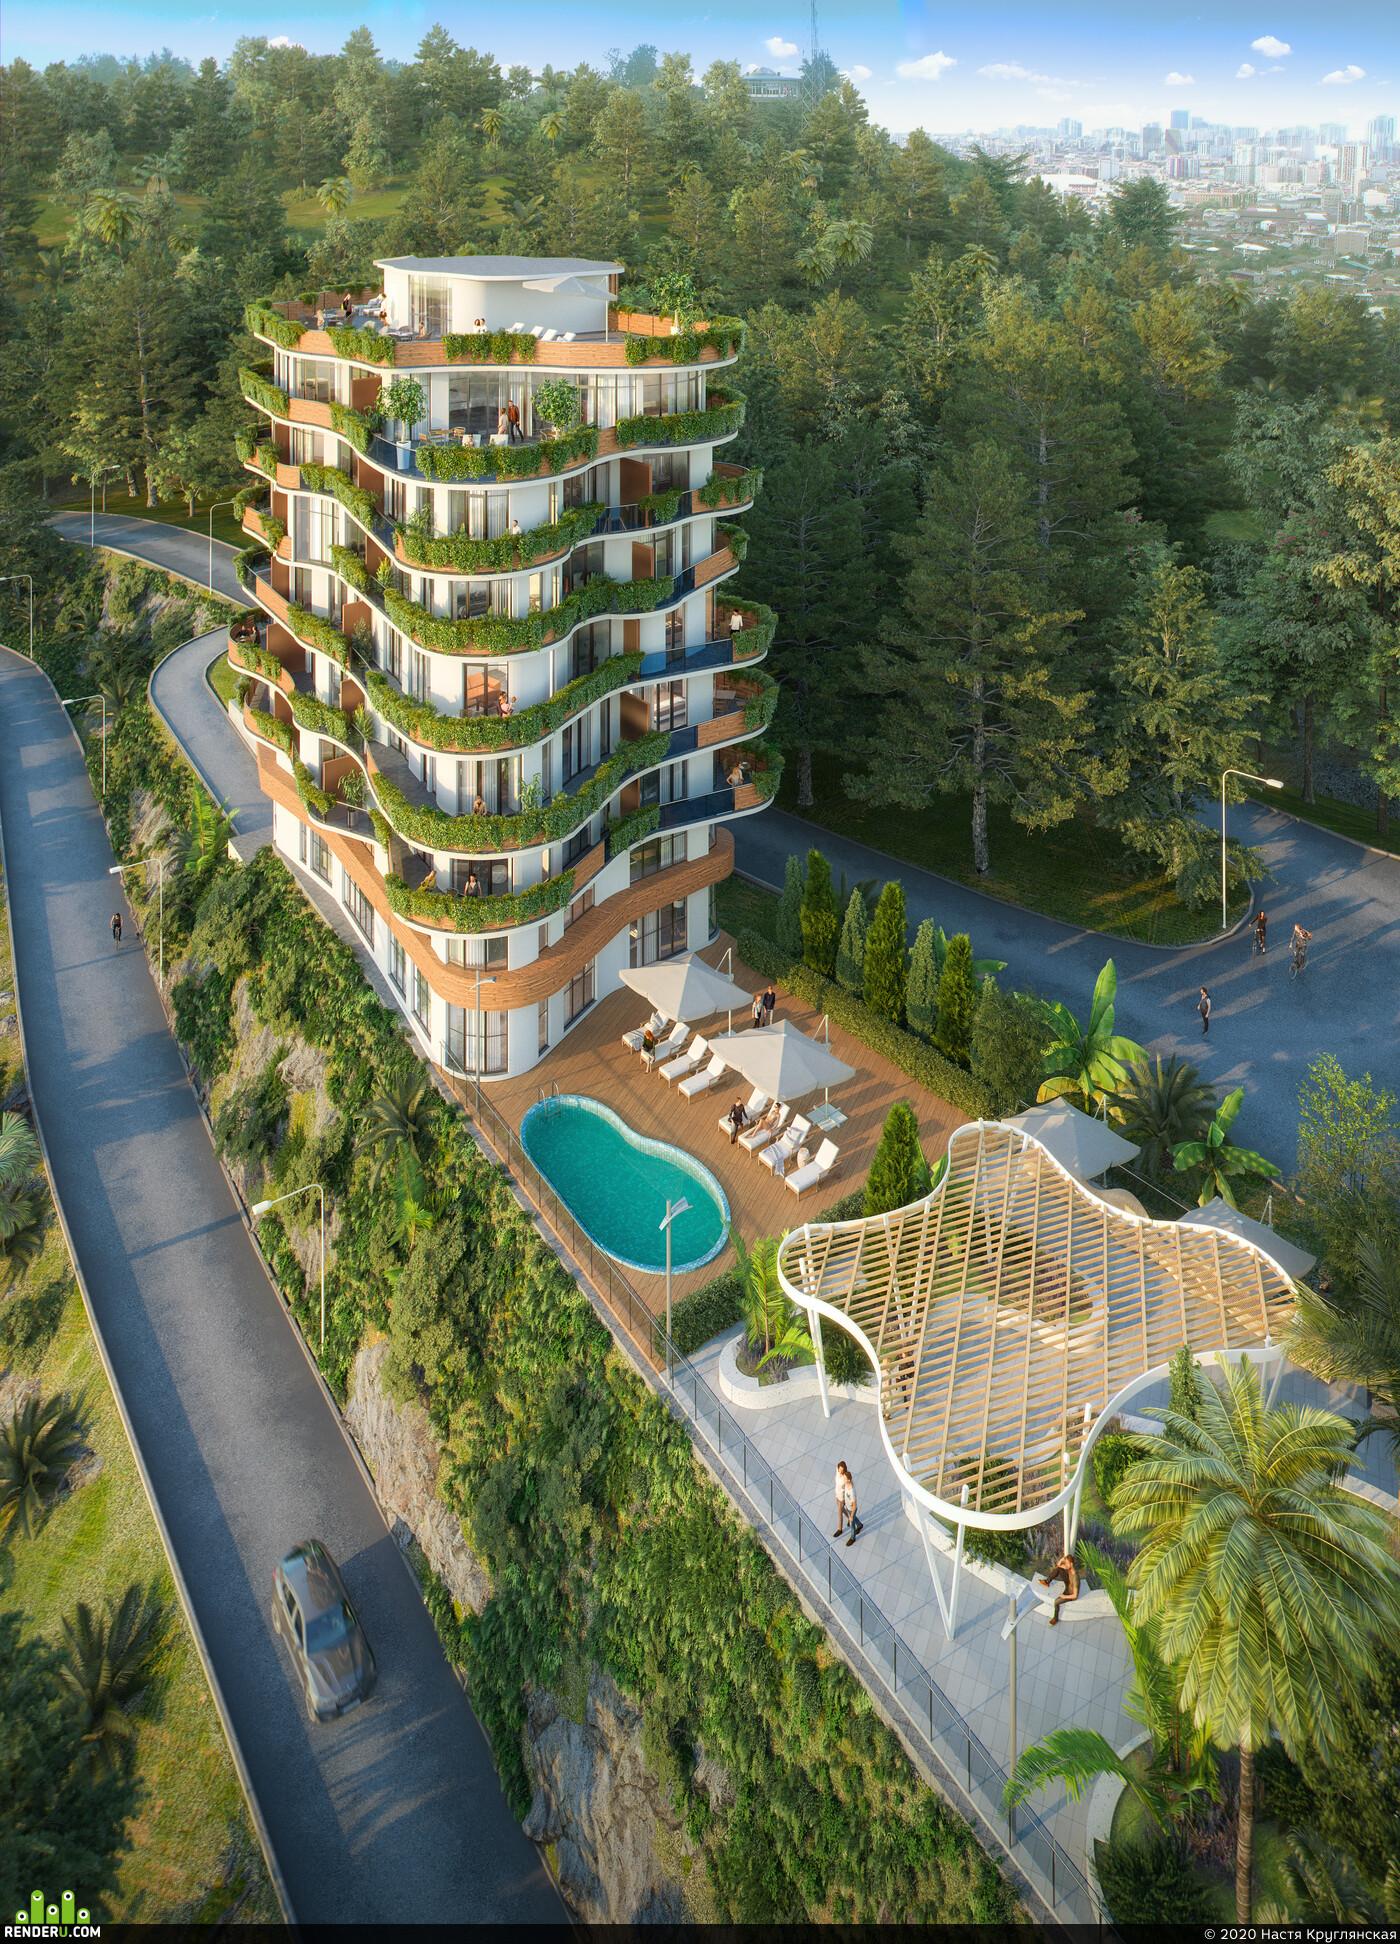 cgi, archviz, rendering, visualization, Exterior, landscape, forest, mountains, hotel, sea